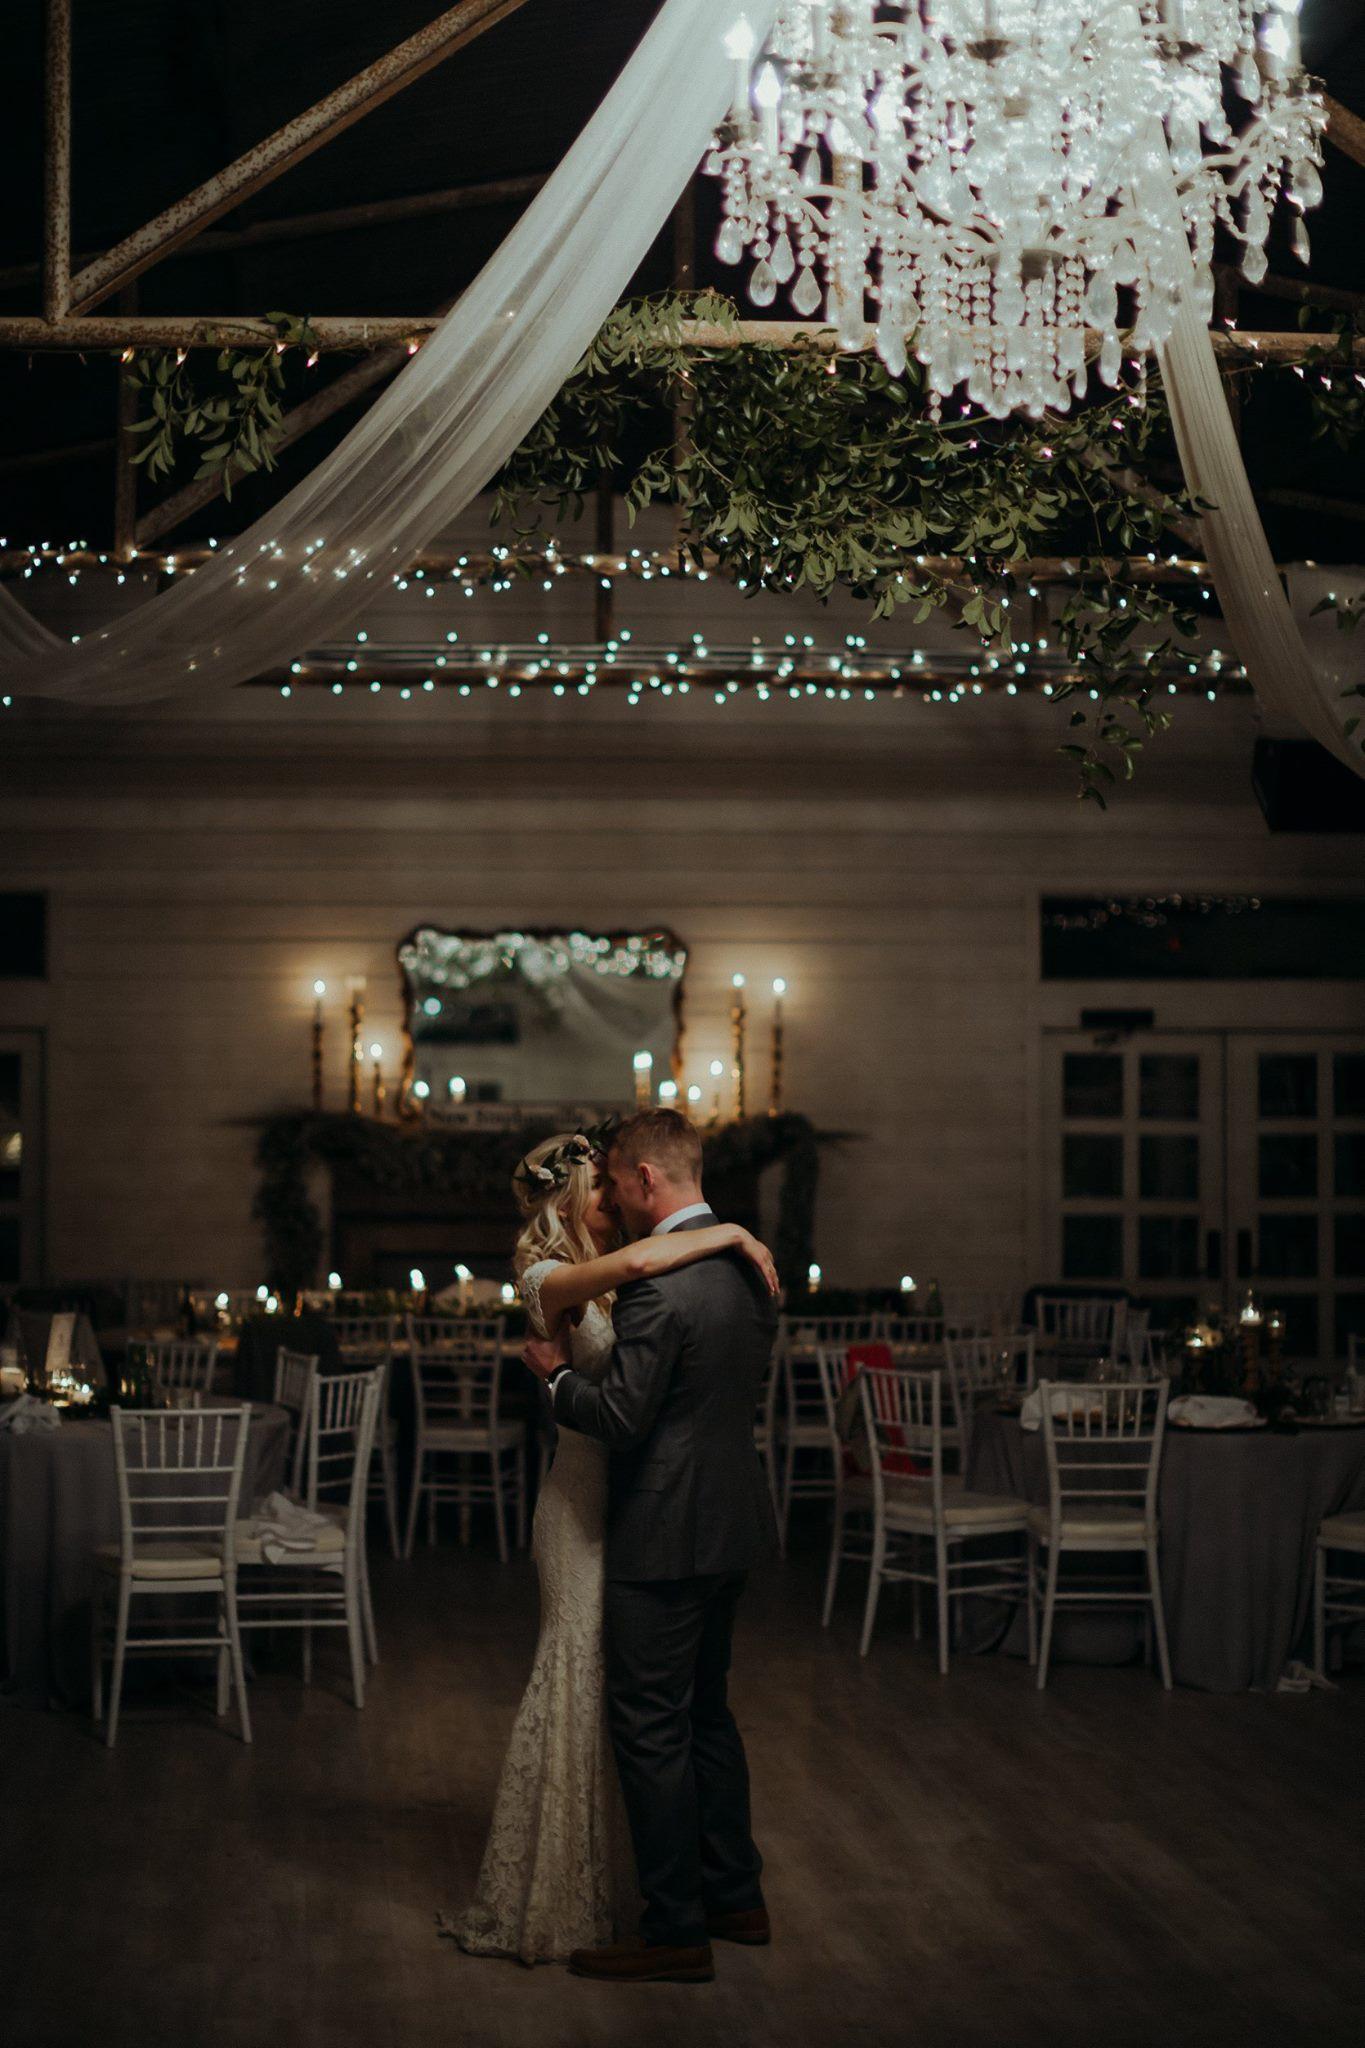 Weddings Unveiled // We're pulling back the veil on Kristen's Decatur, Texas wedding! ivoryandink.com